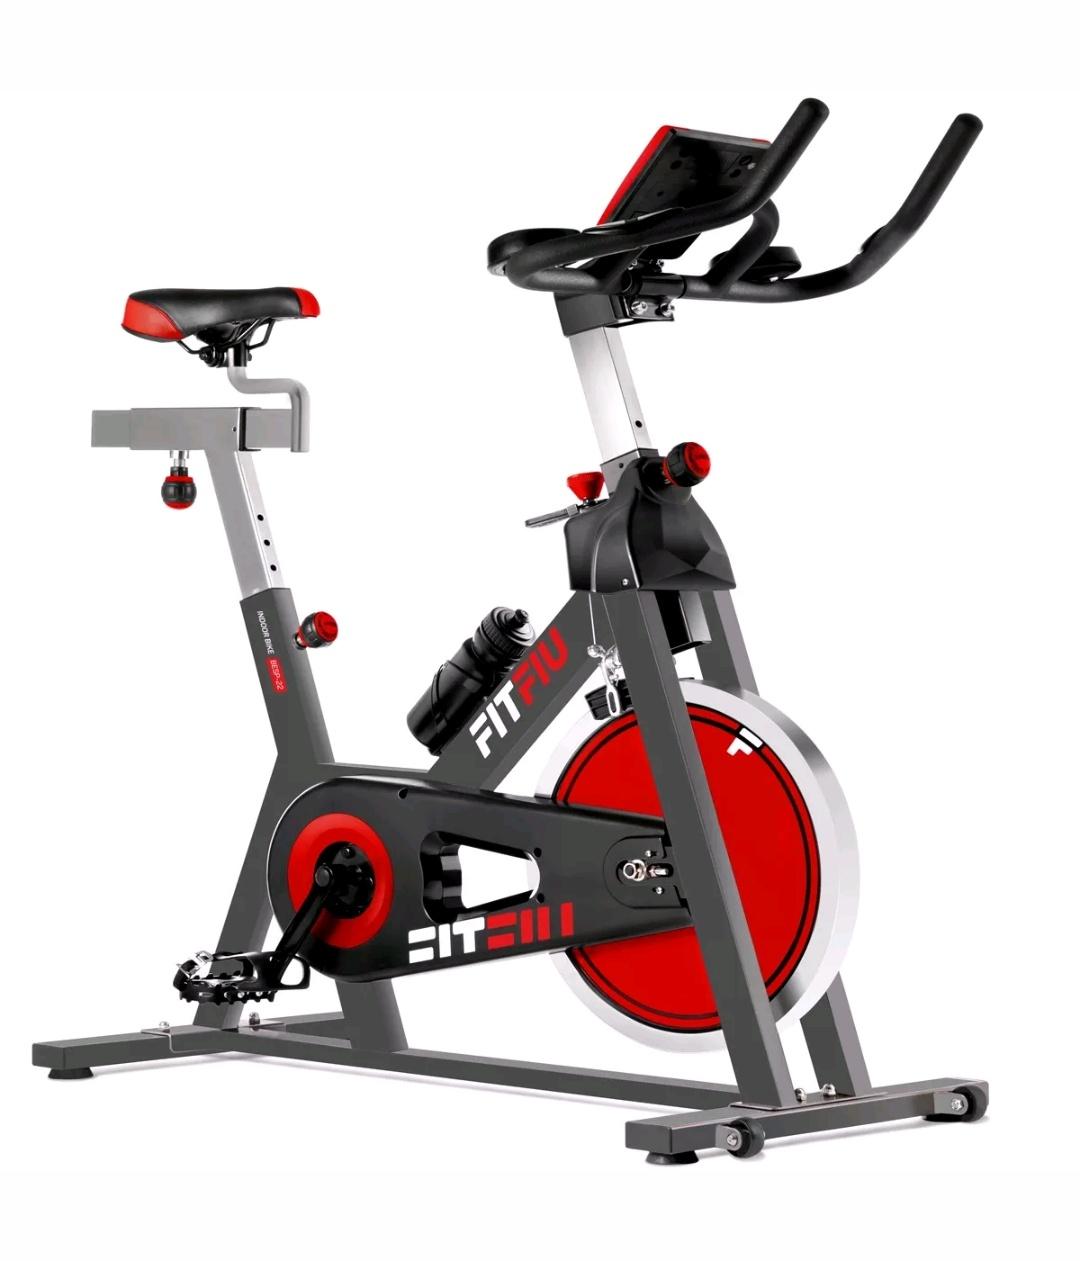 Nueva bicicleta spinning 2018 BESP-22